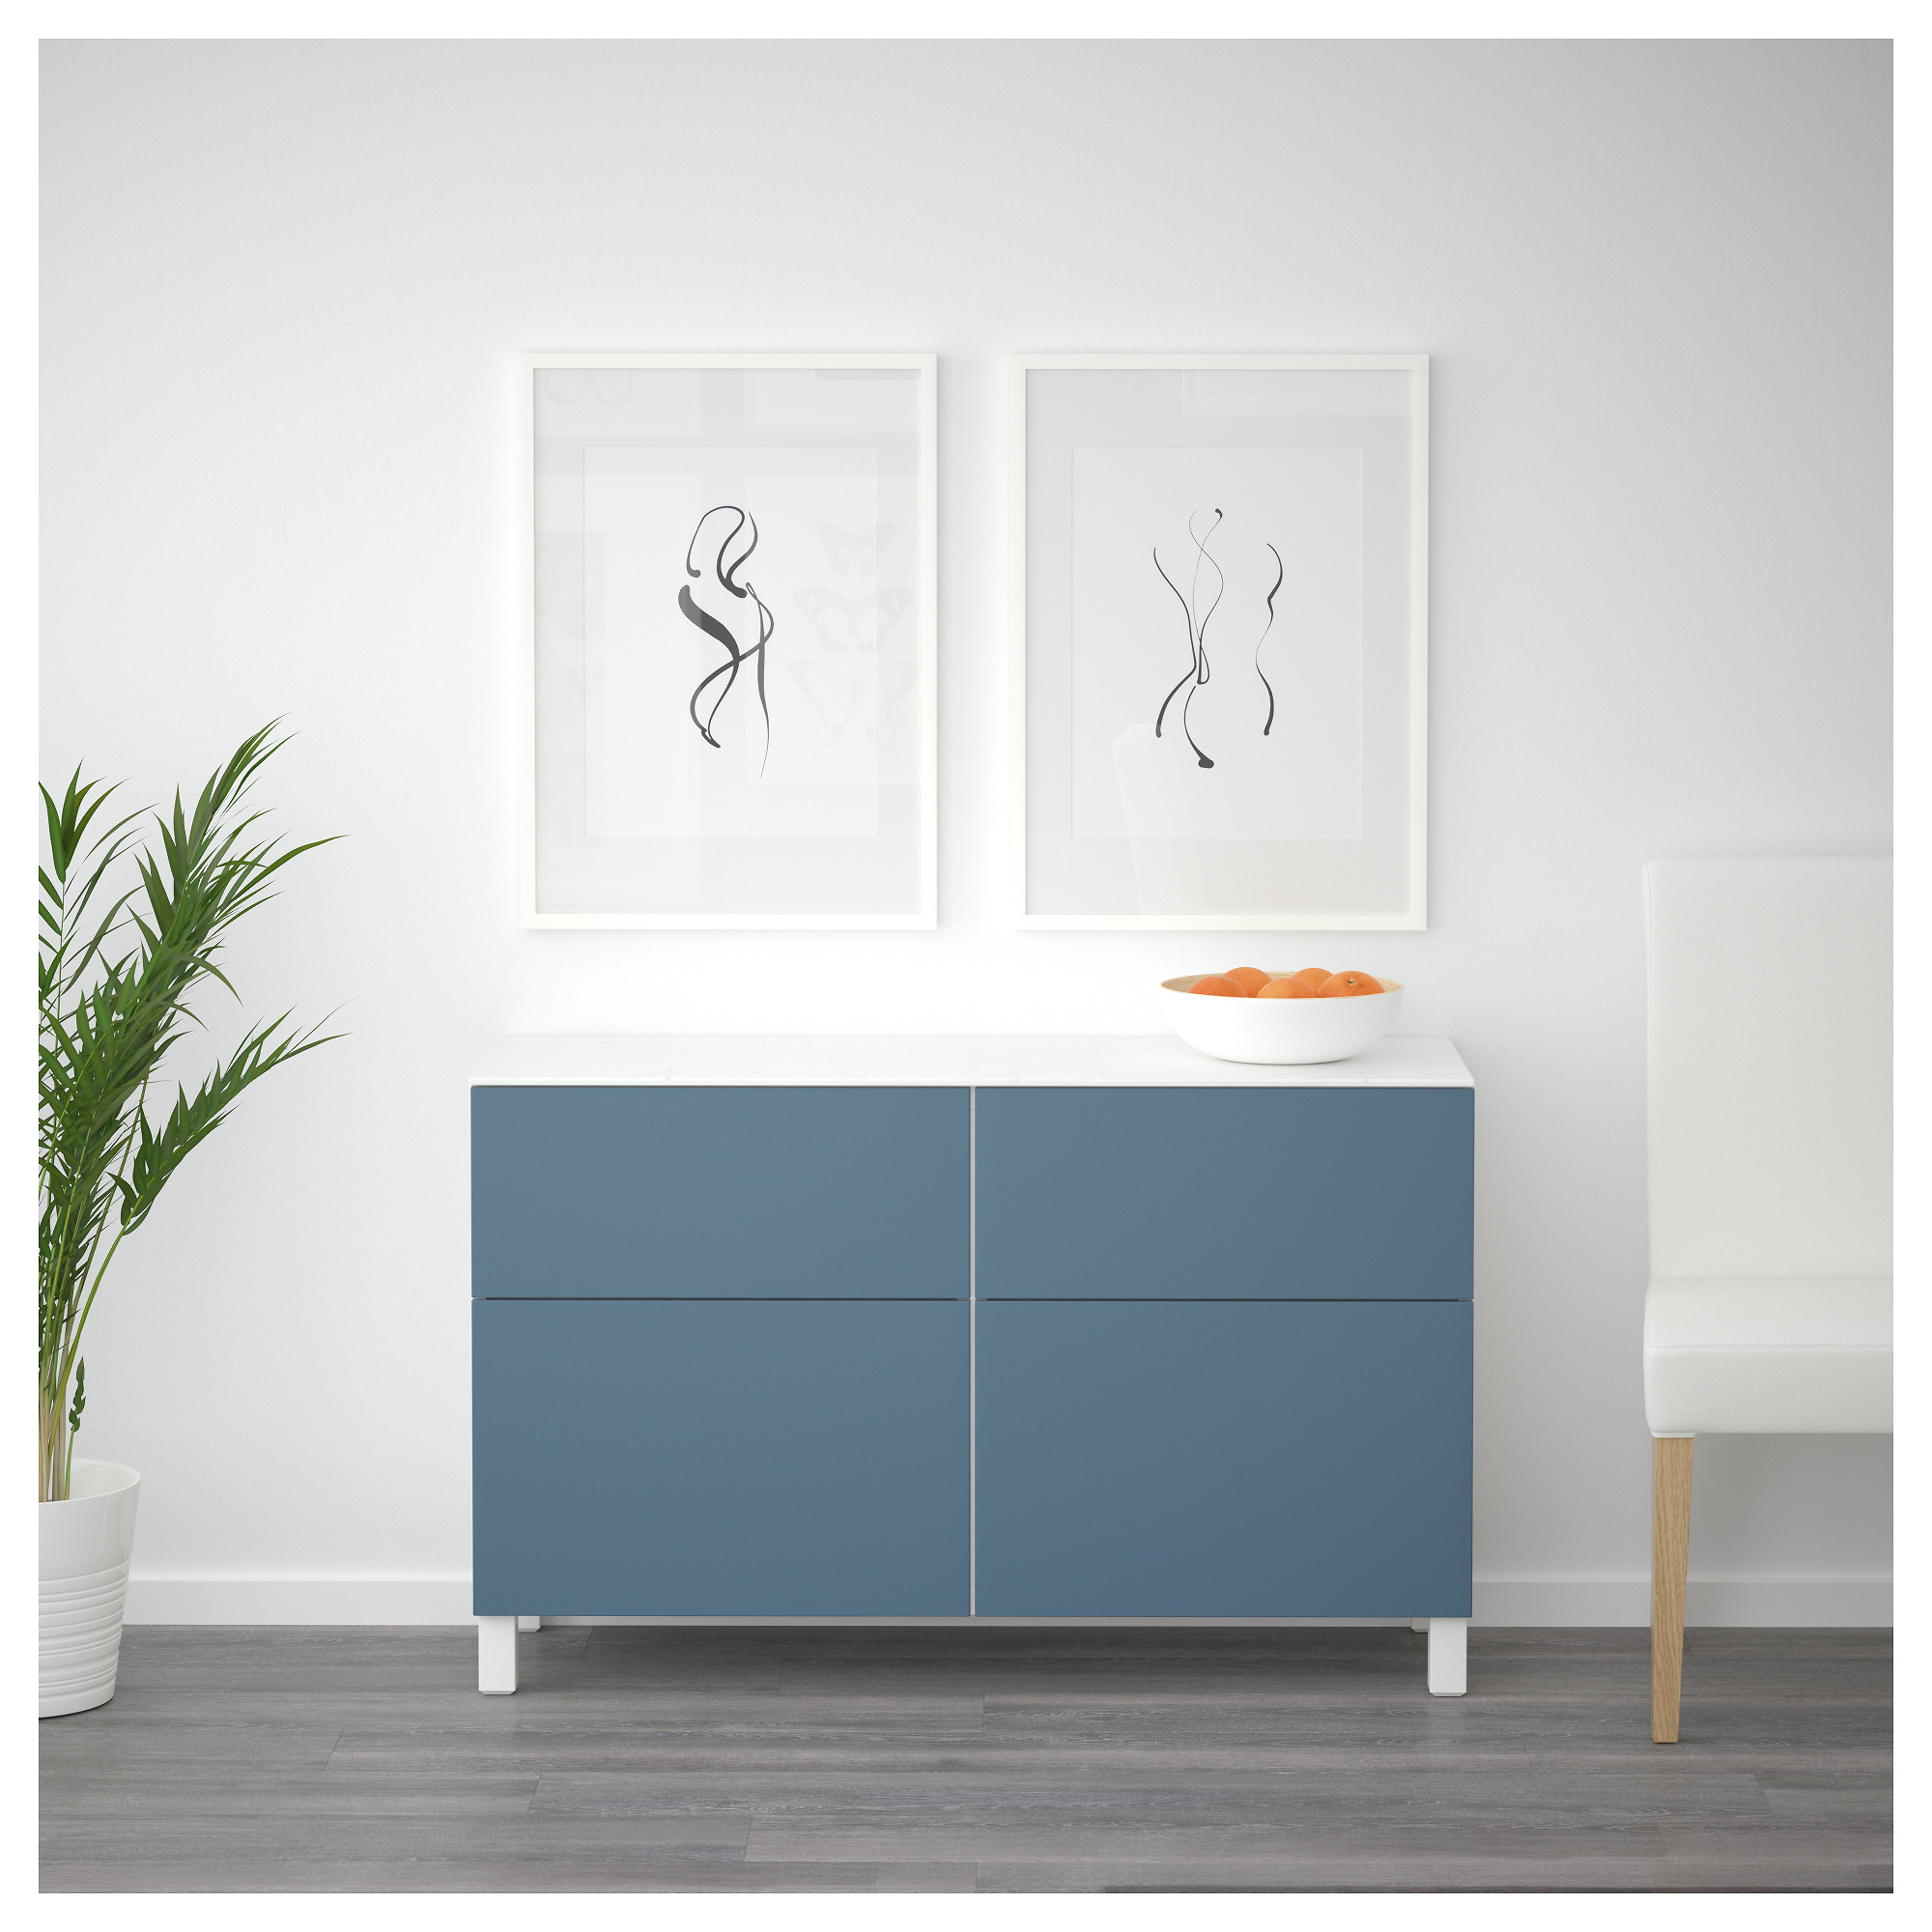 Комбинация для хранения с дверцами, ящиками БЕСТО темно-синий артикуль № 392.447.09 в наличии. Интернет магазин IKEA Минск. Недорогая доставка и установка.